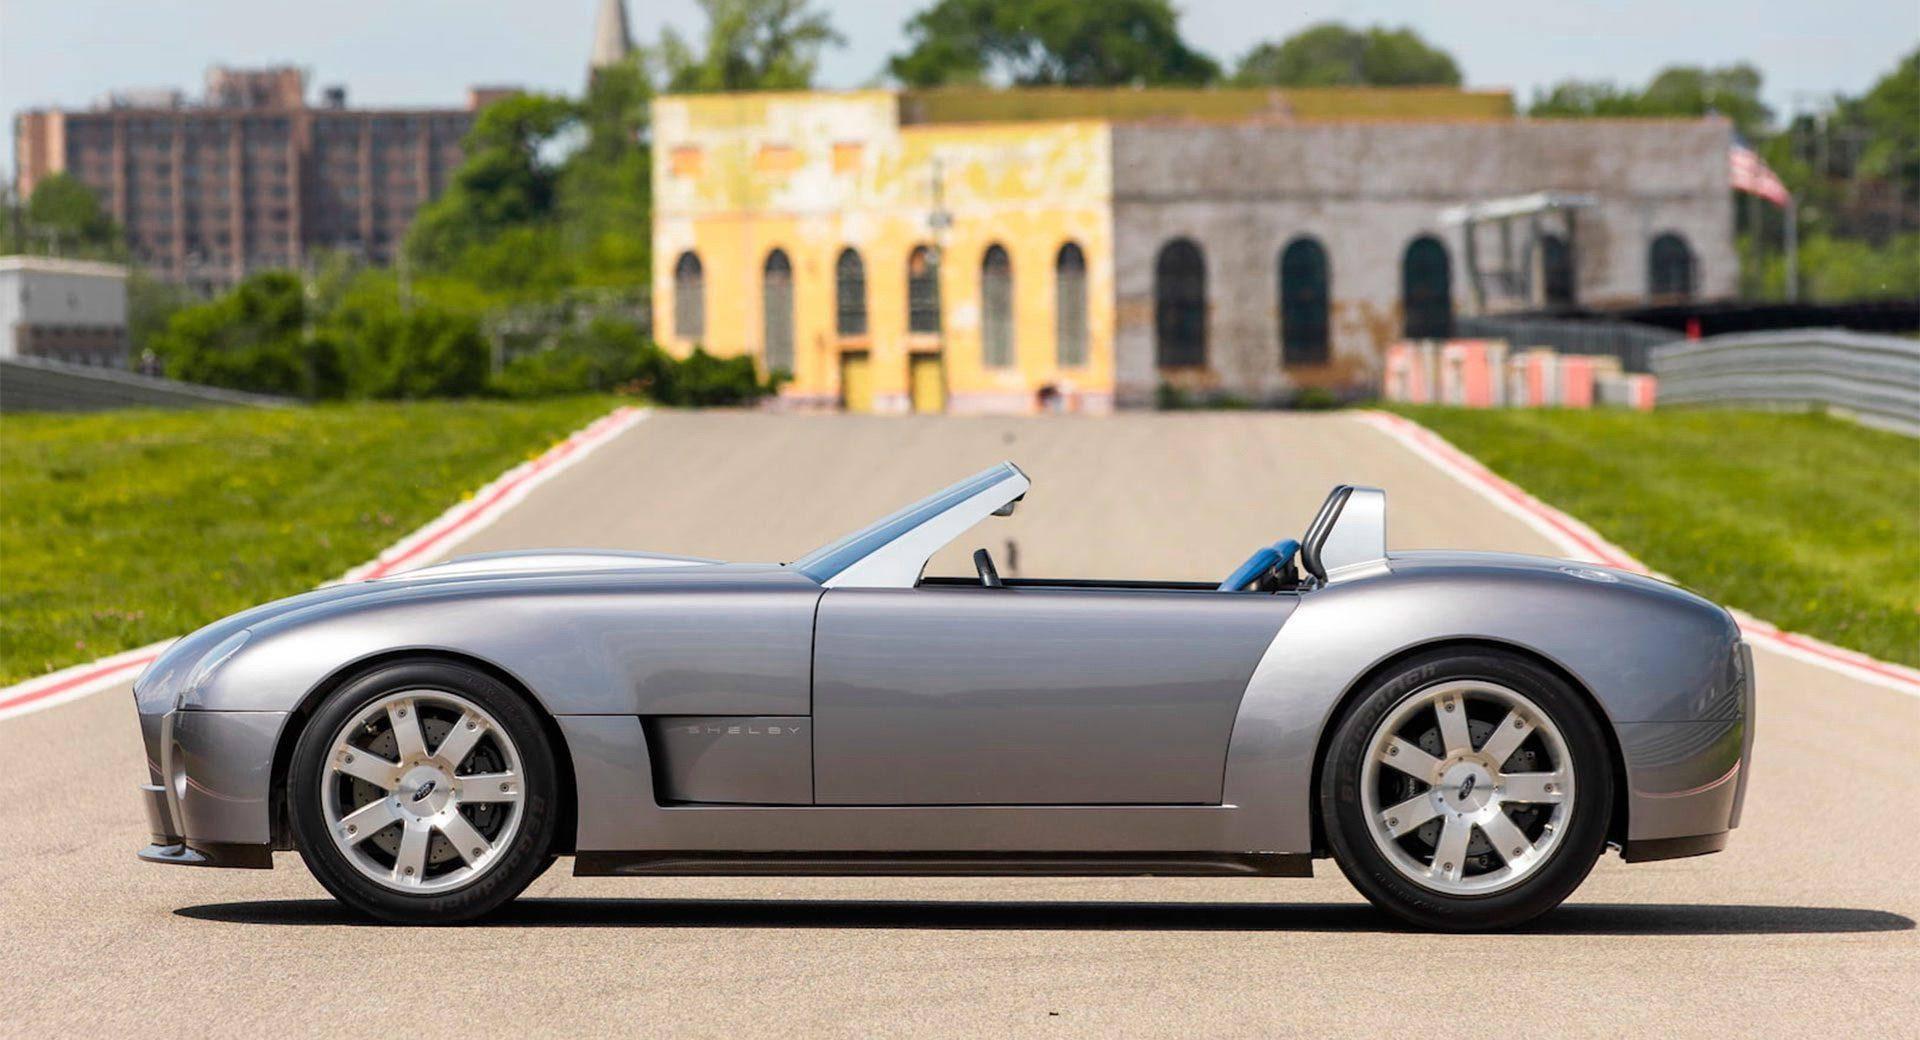 2004_Ford_Shelby_Cobra_Concept-0001